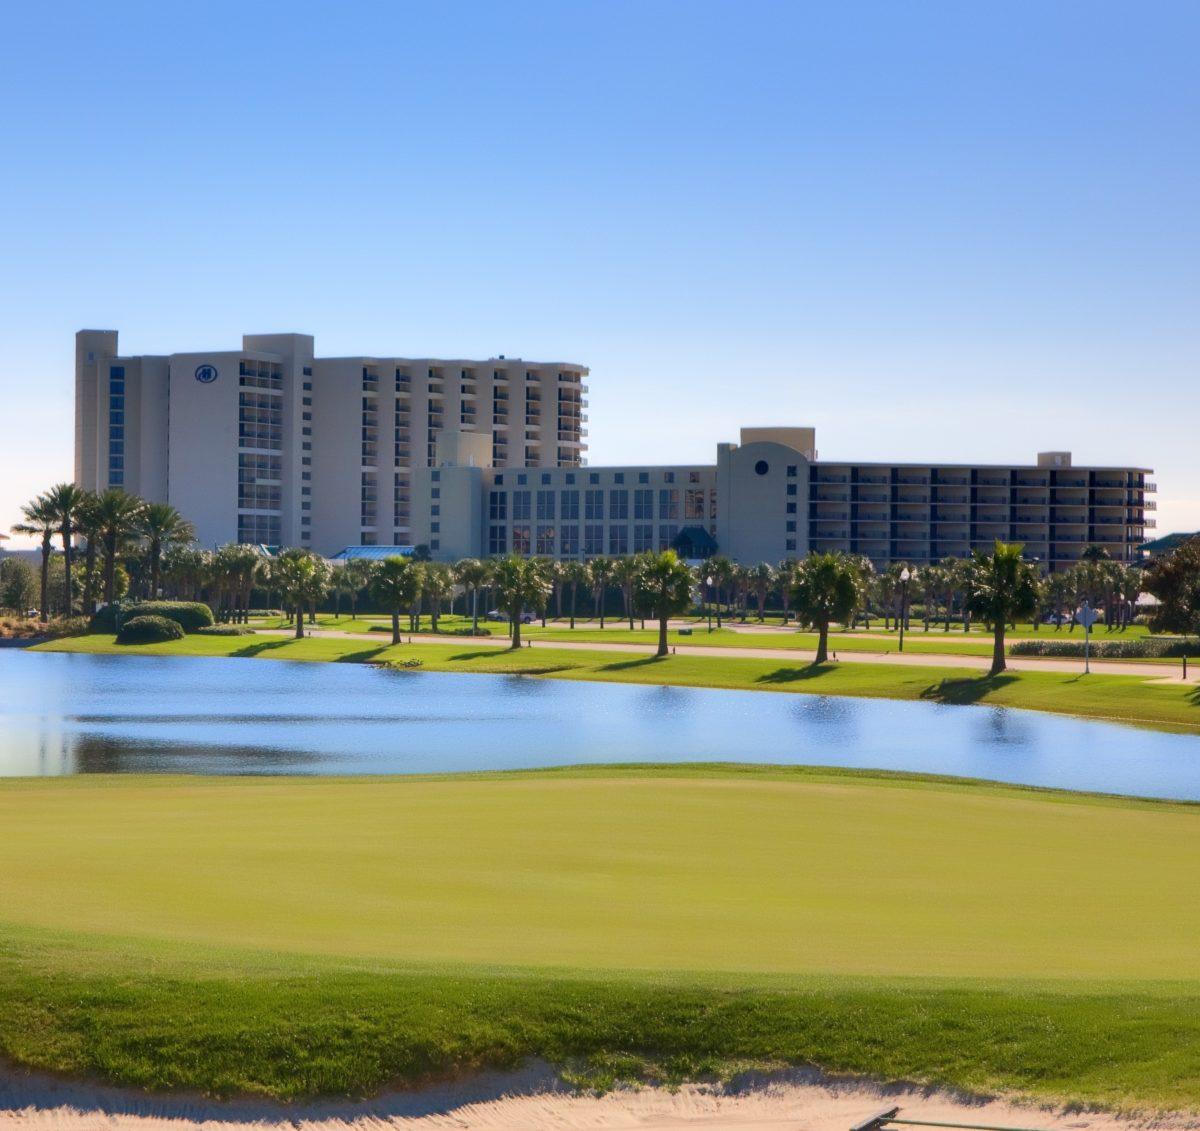 Hilton Sandestin Beach Golf Resort & Spa in Florida has a great golf course